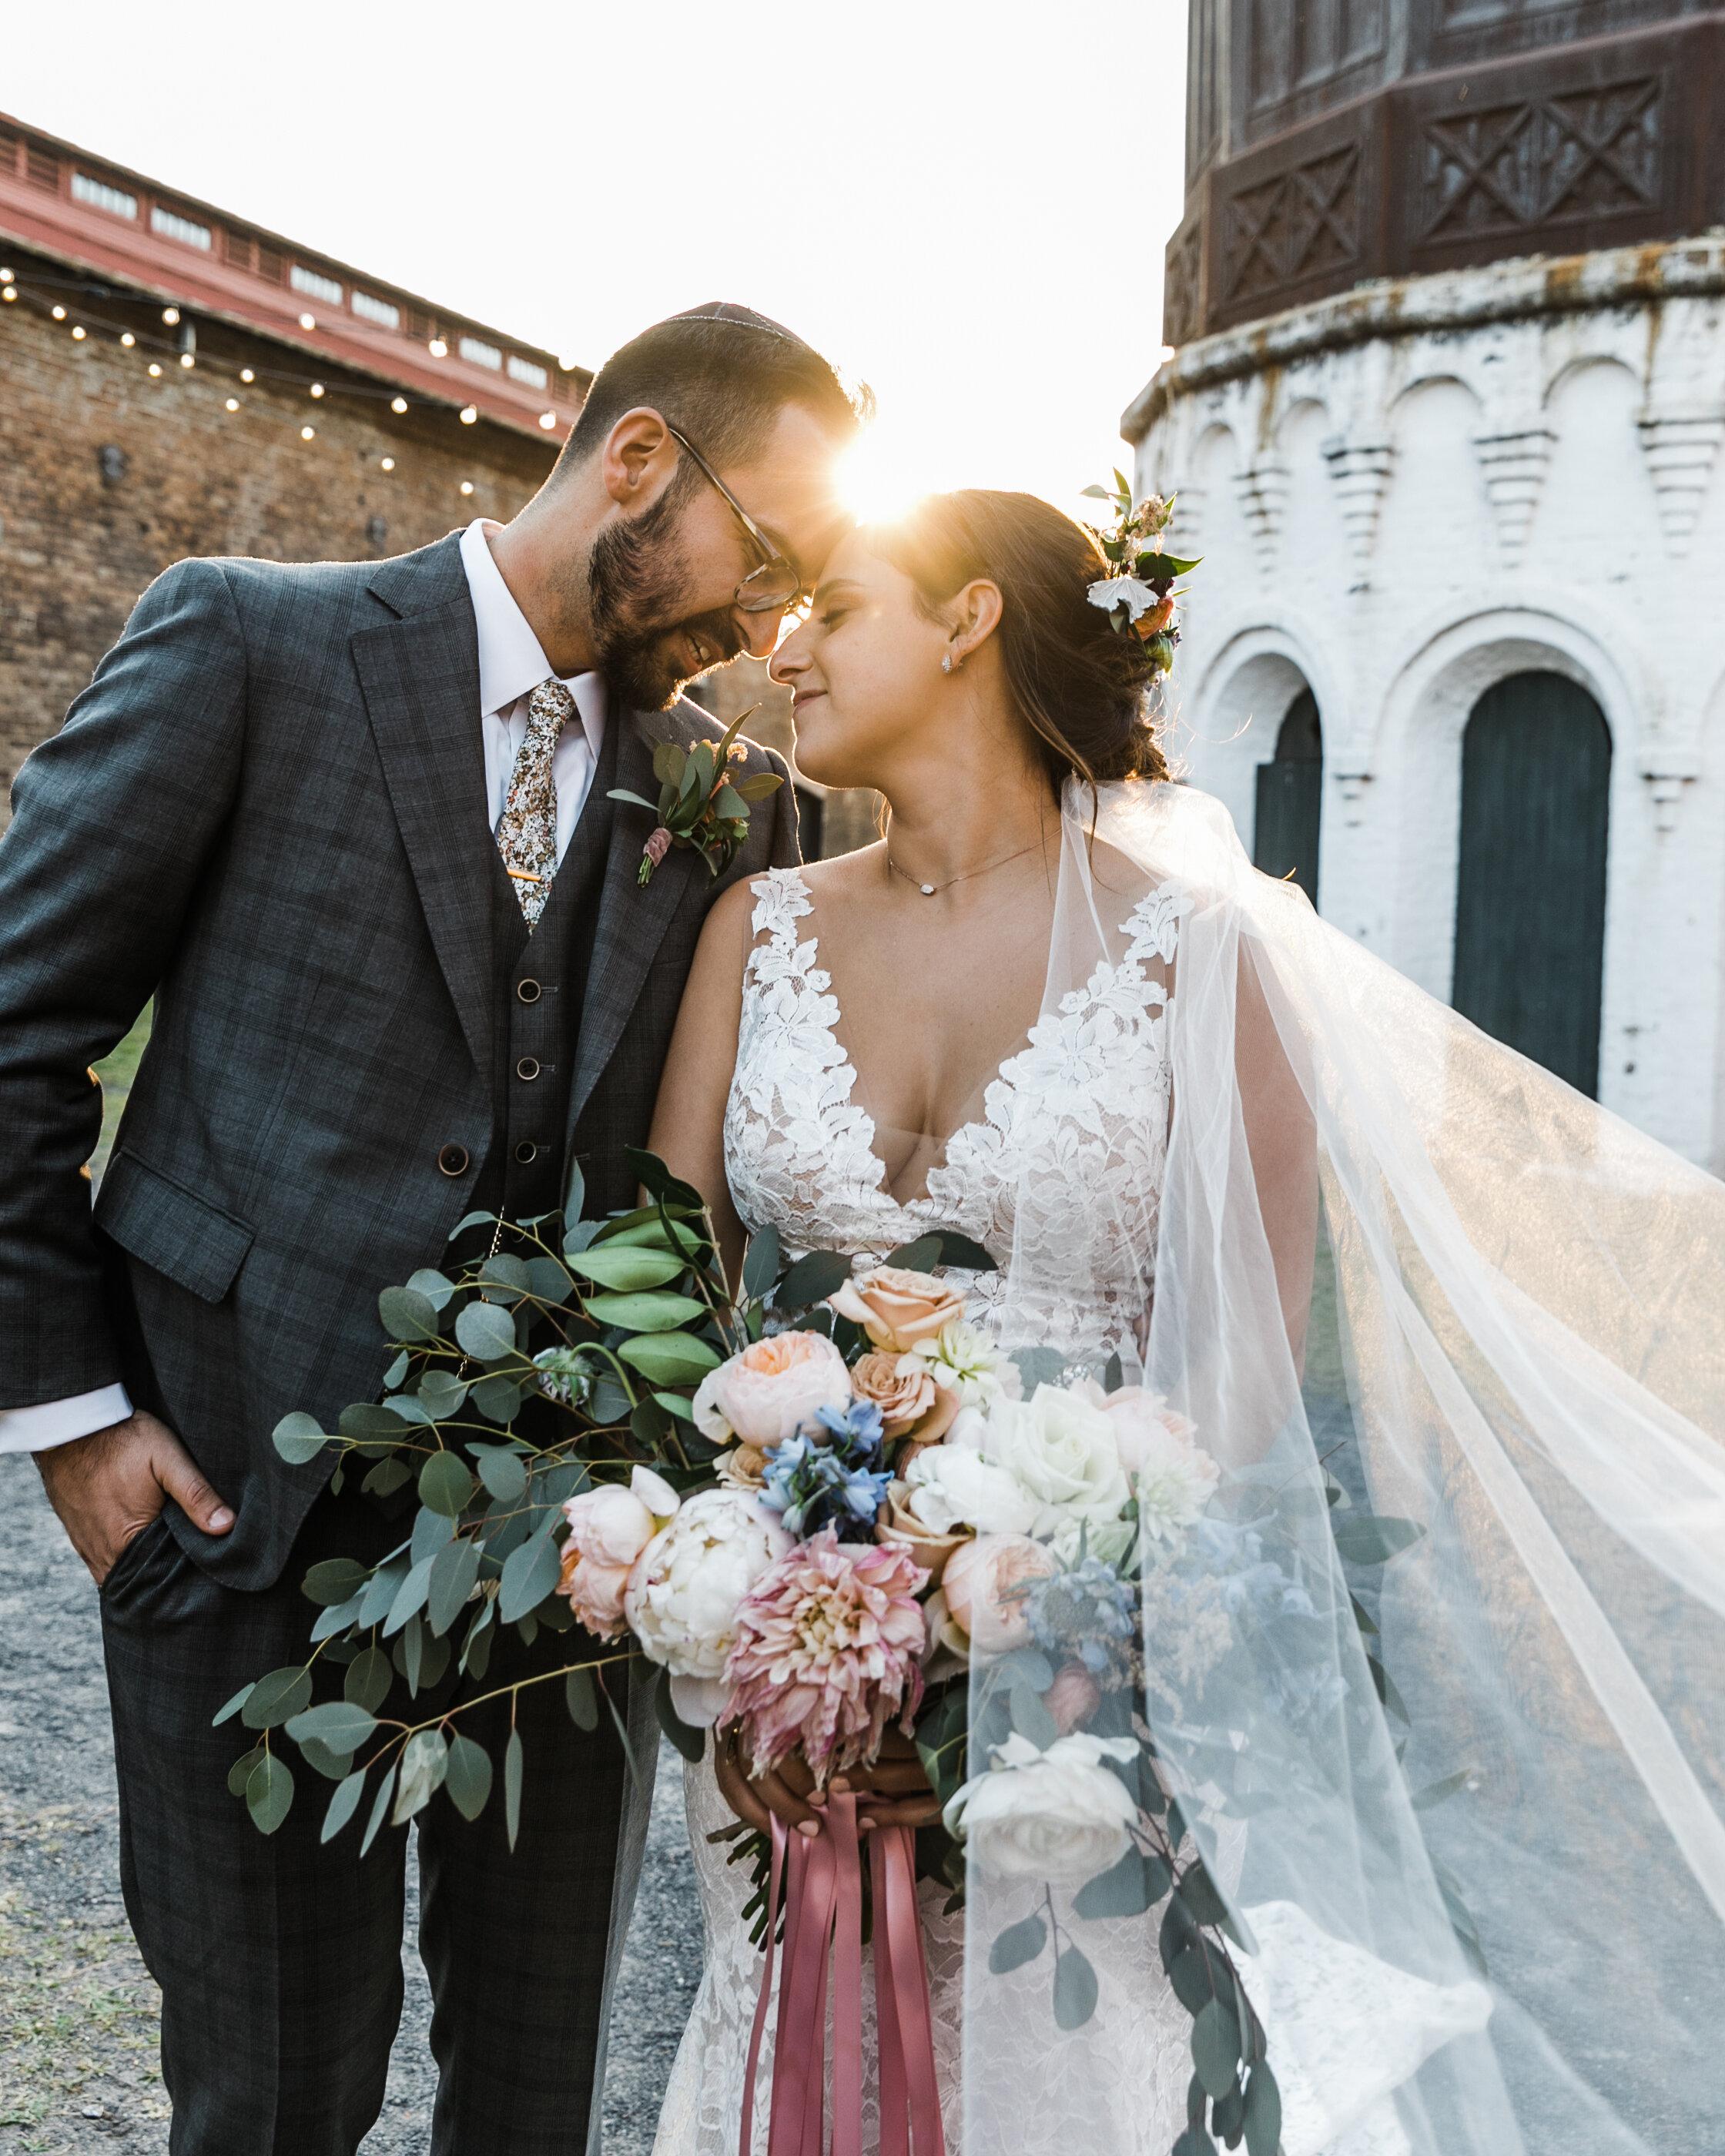 ivory-and-beau-blog-weddings-ivory-and-beau-couple-dominique-and-andres-savannah-florist-wedding-planning-savannah-bridal-boutique-wedding-flowers-KIP_WEBERWEDDING_RAILROADMUSEUM-1278.JPG